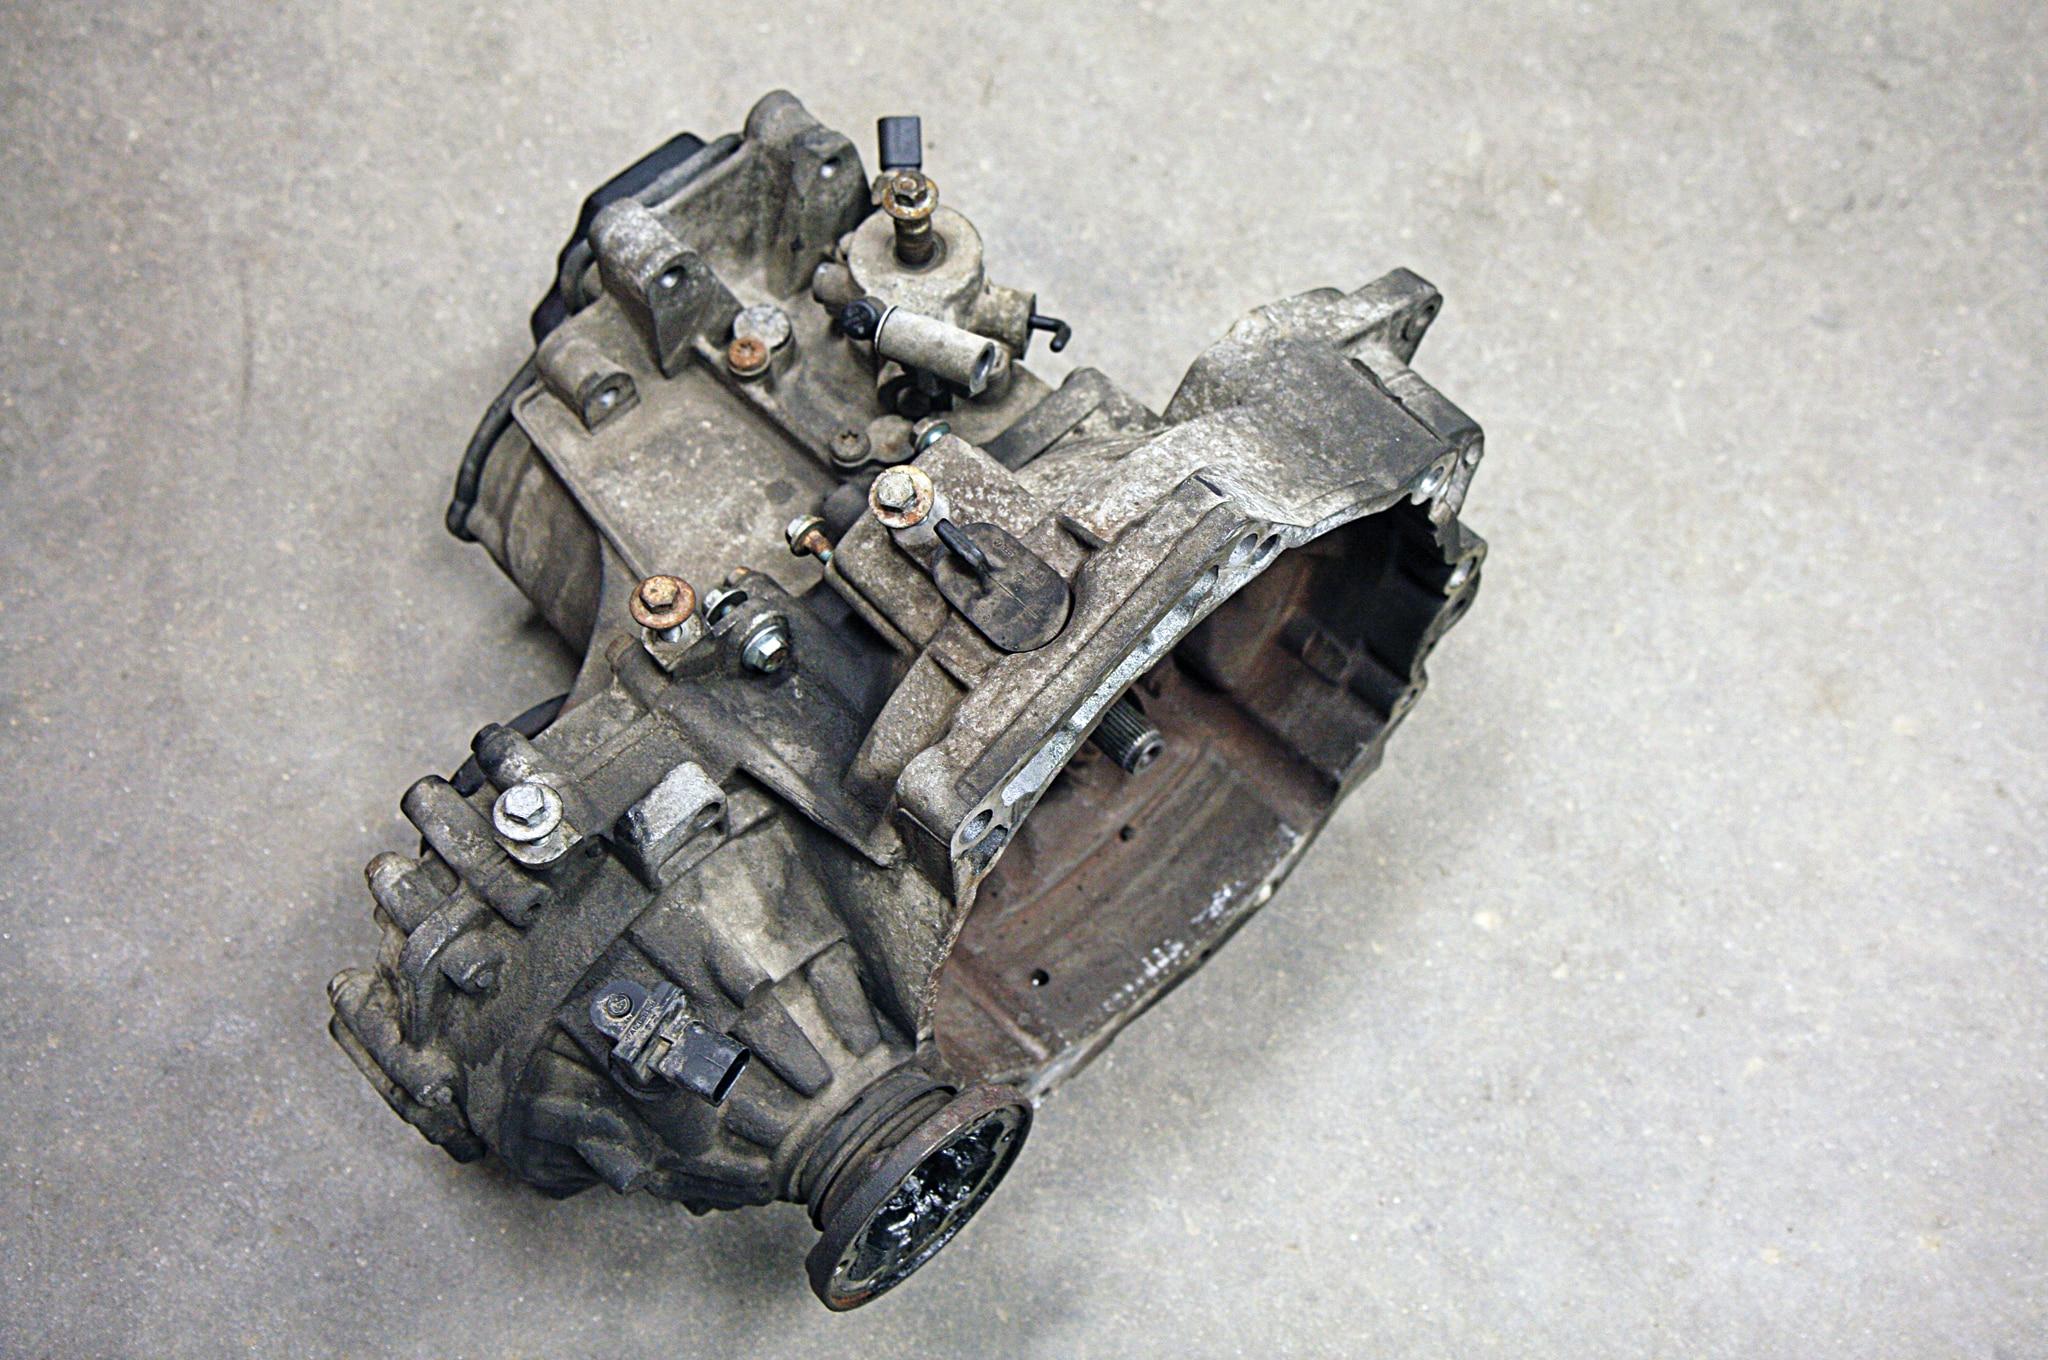 hight resolution of 2002 volkswagen jetta tdi stock auto transmission view photo gallery 13 photos